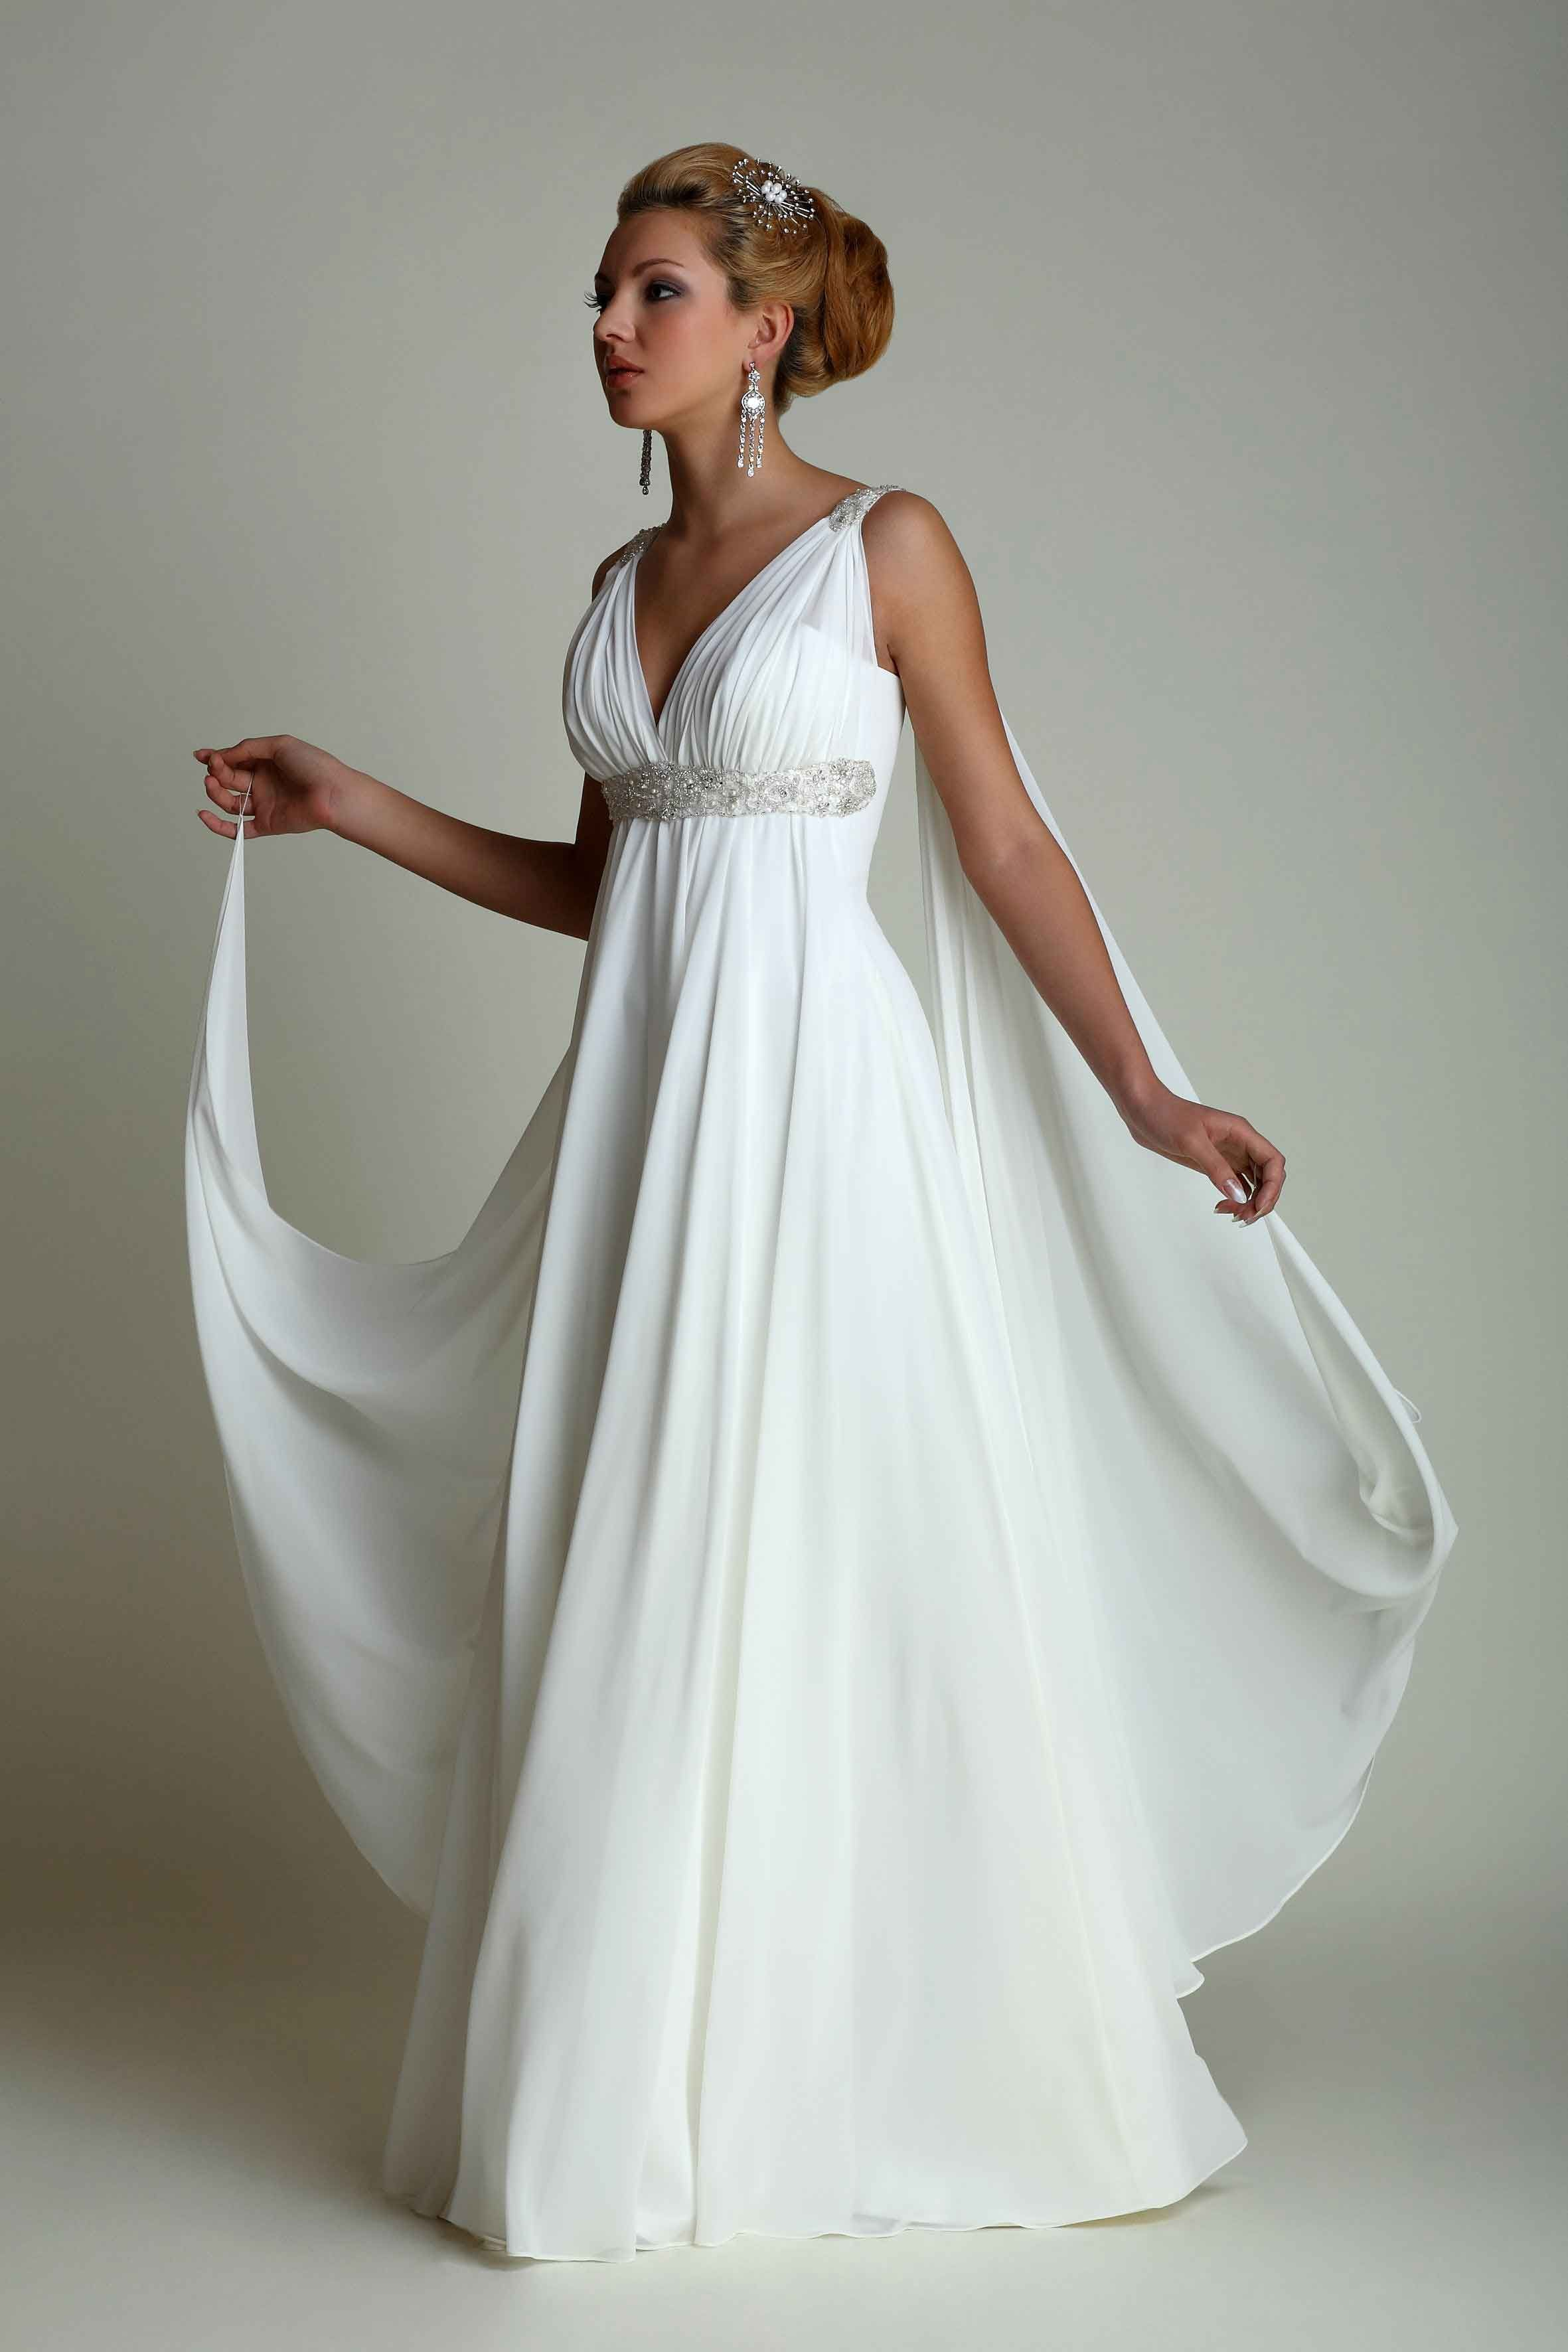 Grecian style wedding dress plus size more wedding pinterest